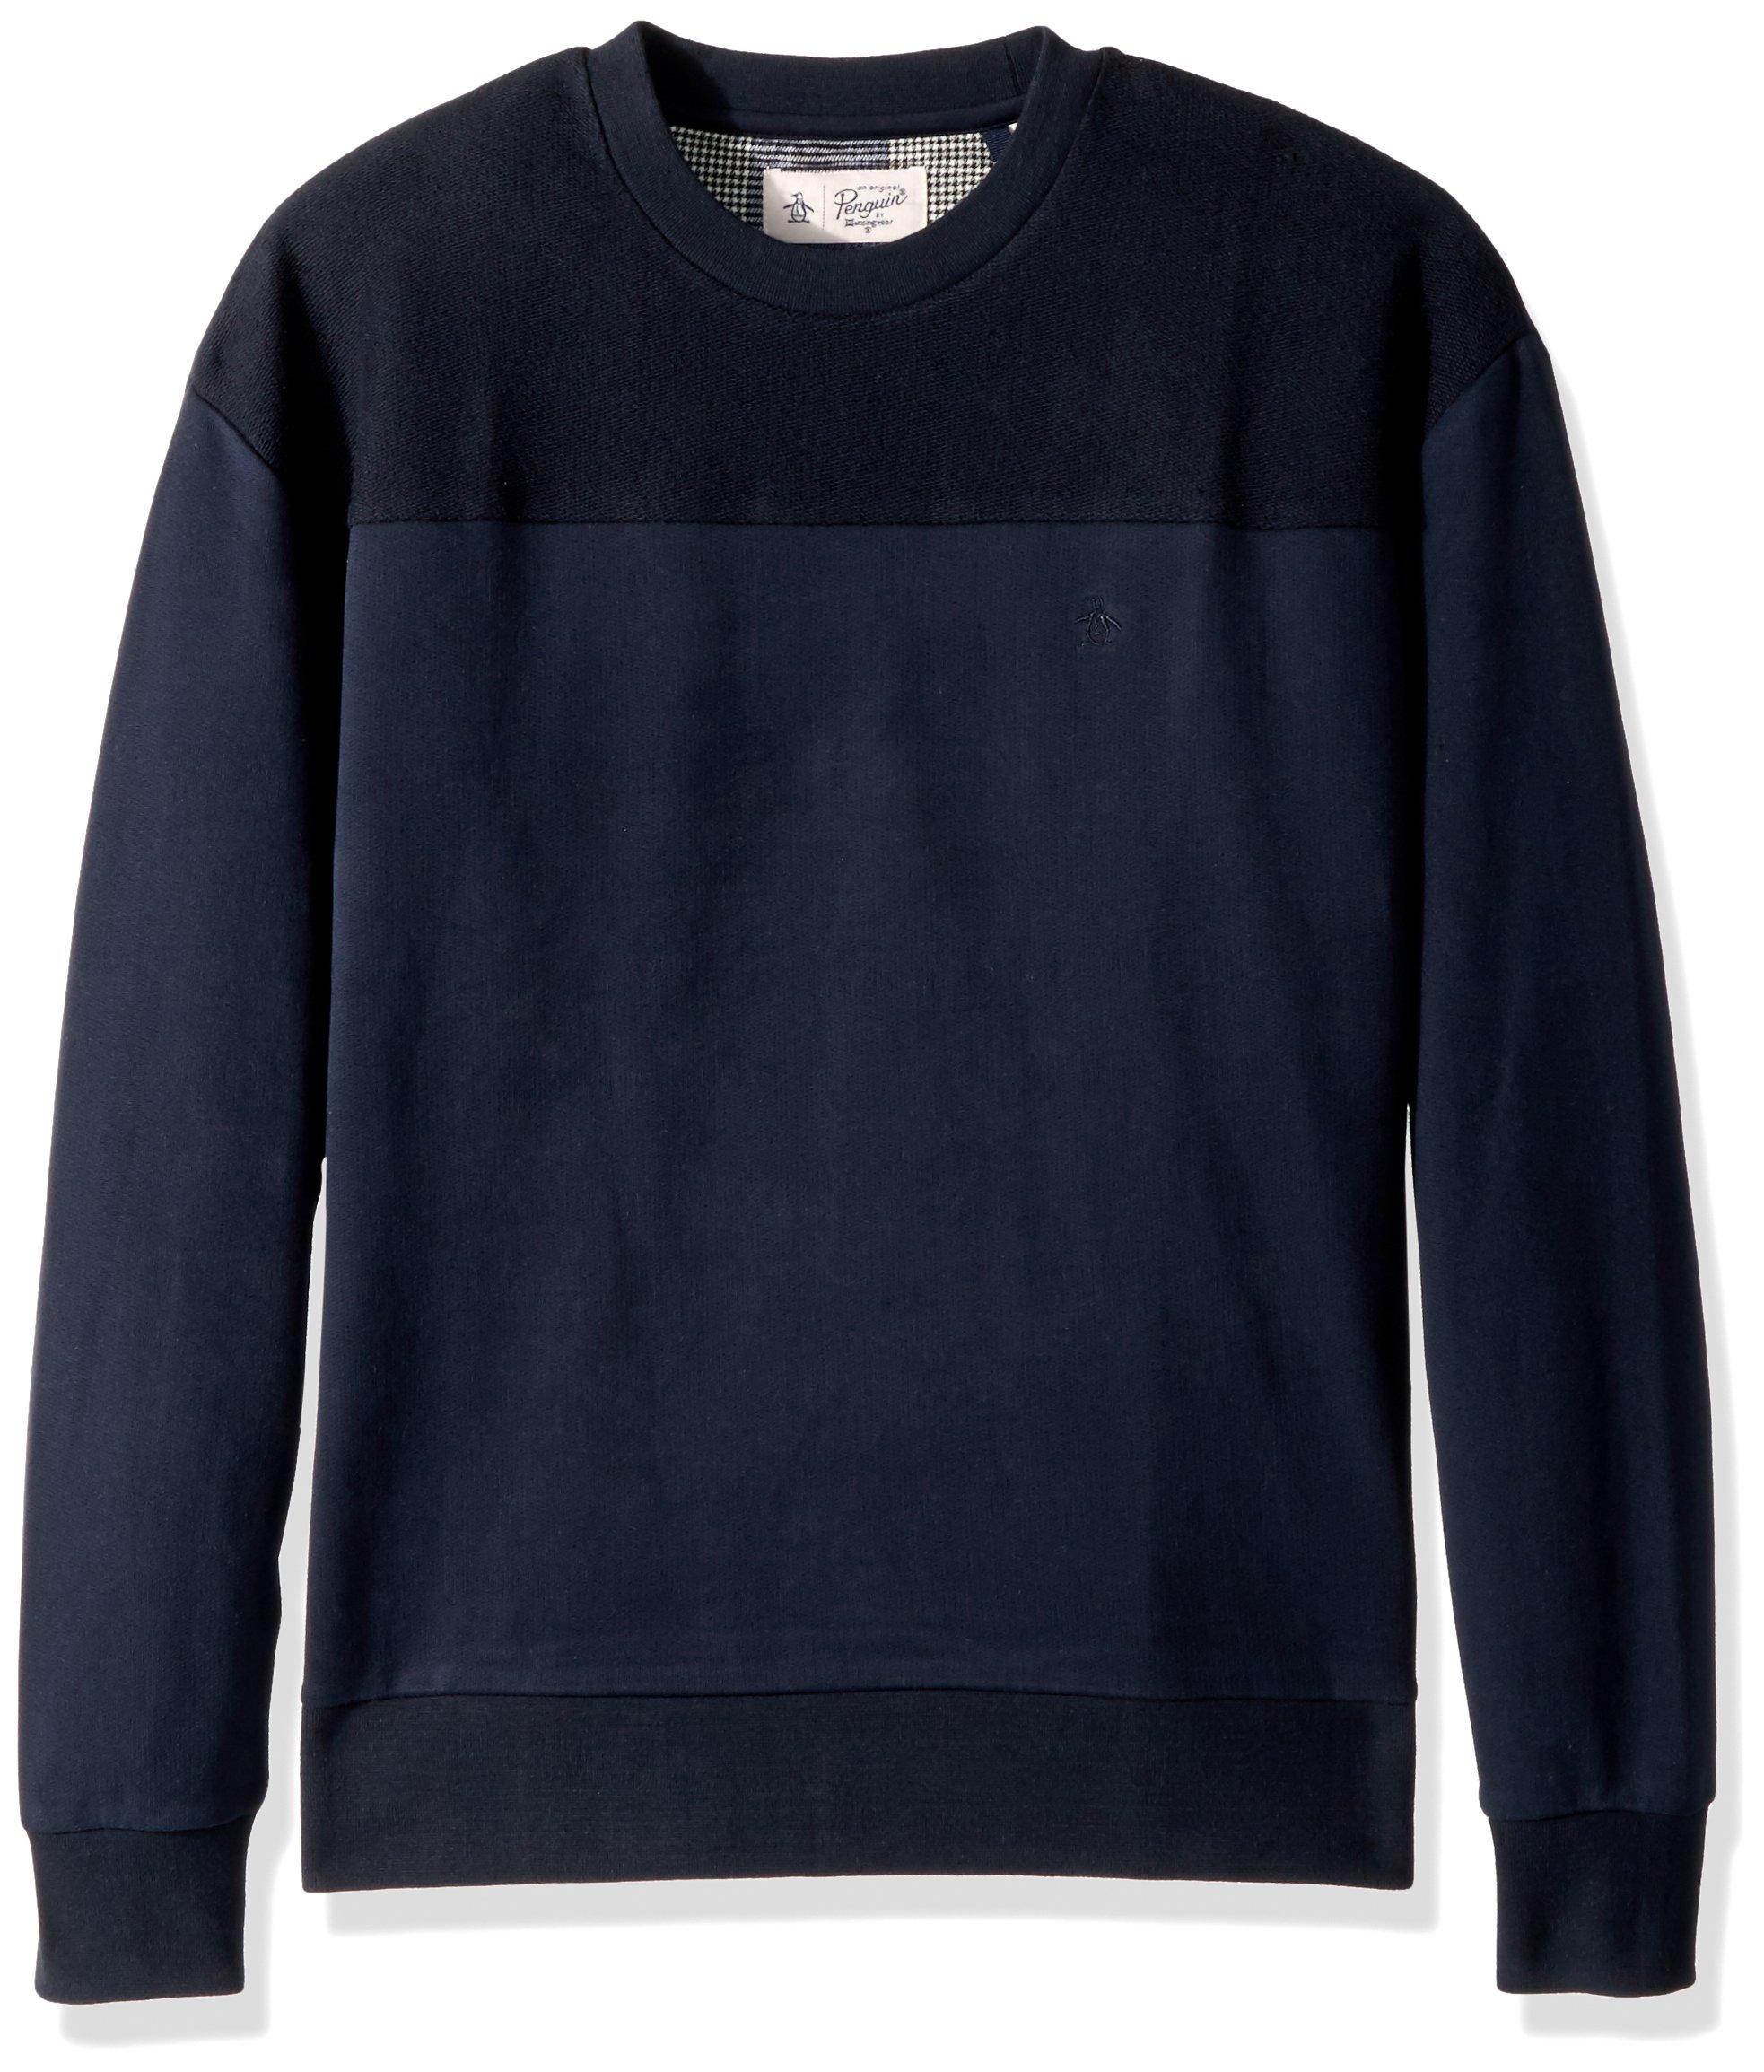 Original Penguin Men's Drop Shoulder Crew Sweater, Dark Sapphire, Medium